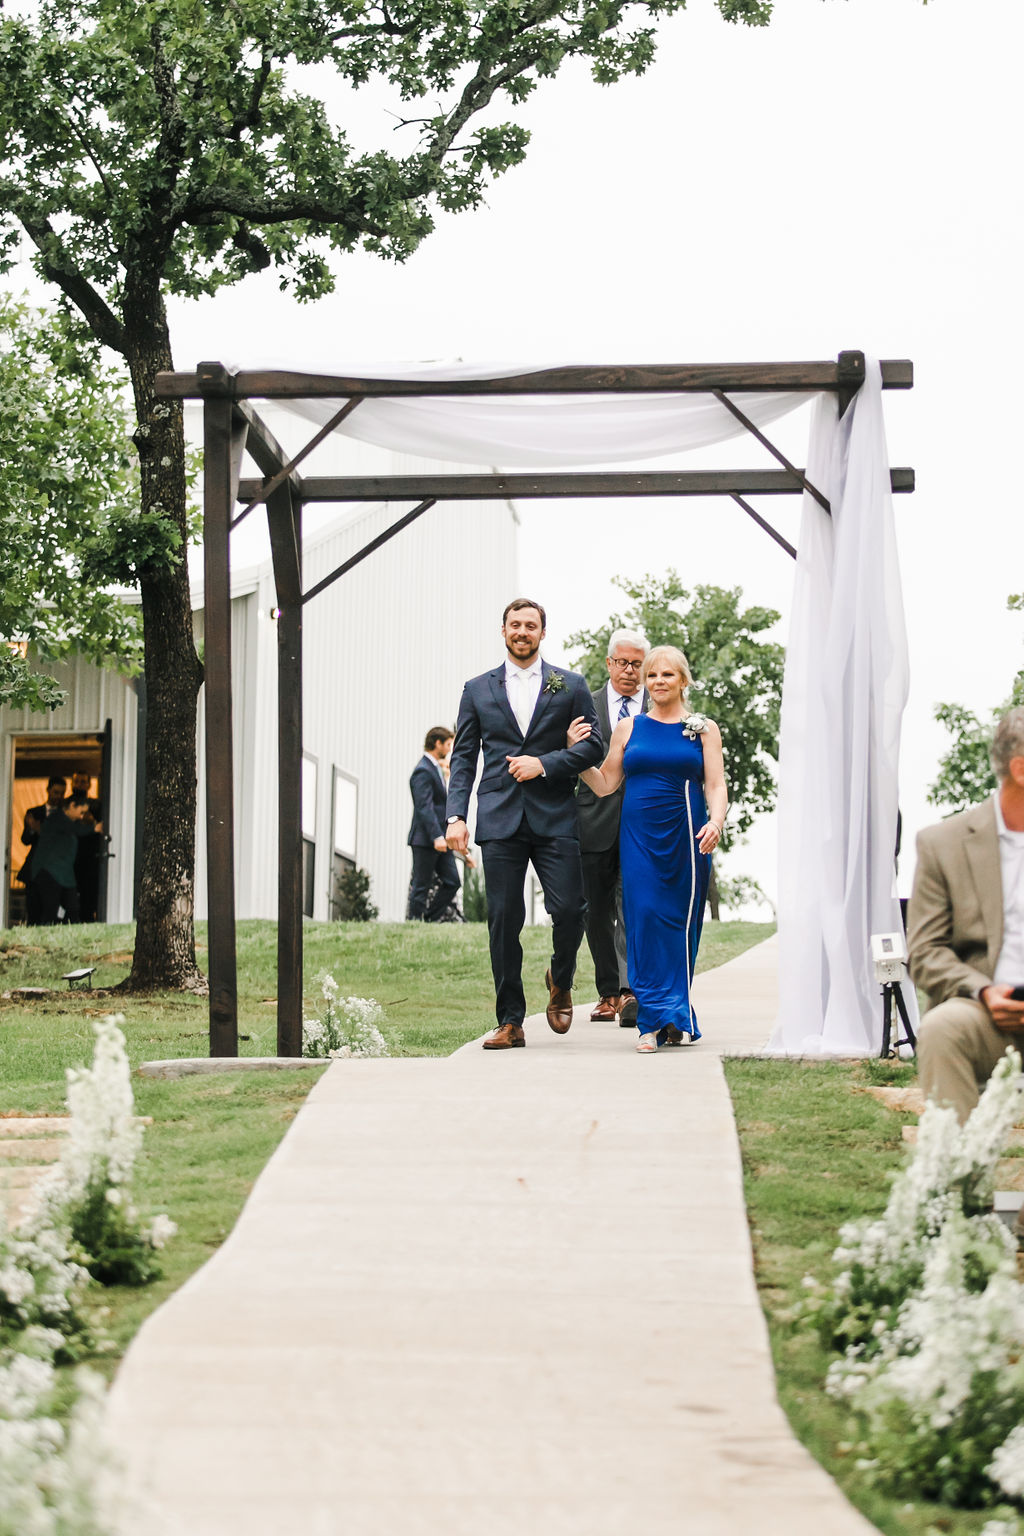 Dream Point Ranch Tulsa's White Barn Wedding Venue 65.jpg